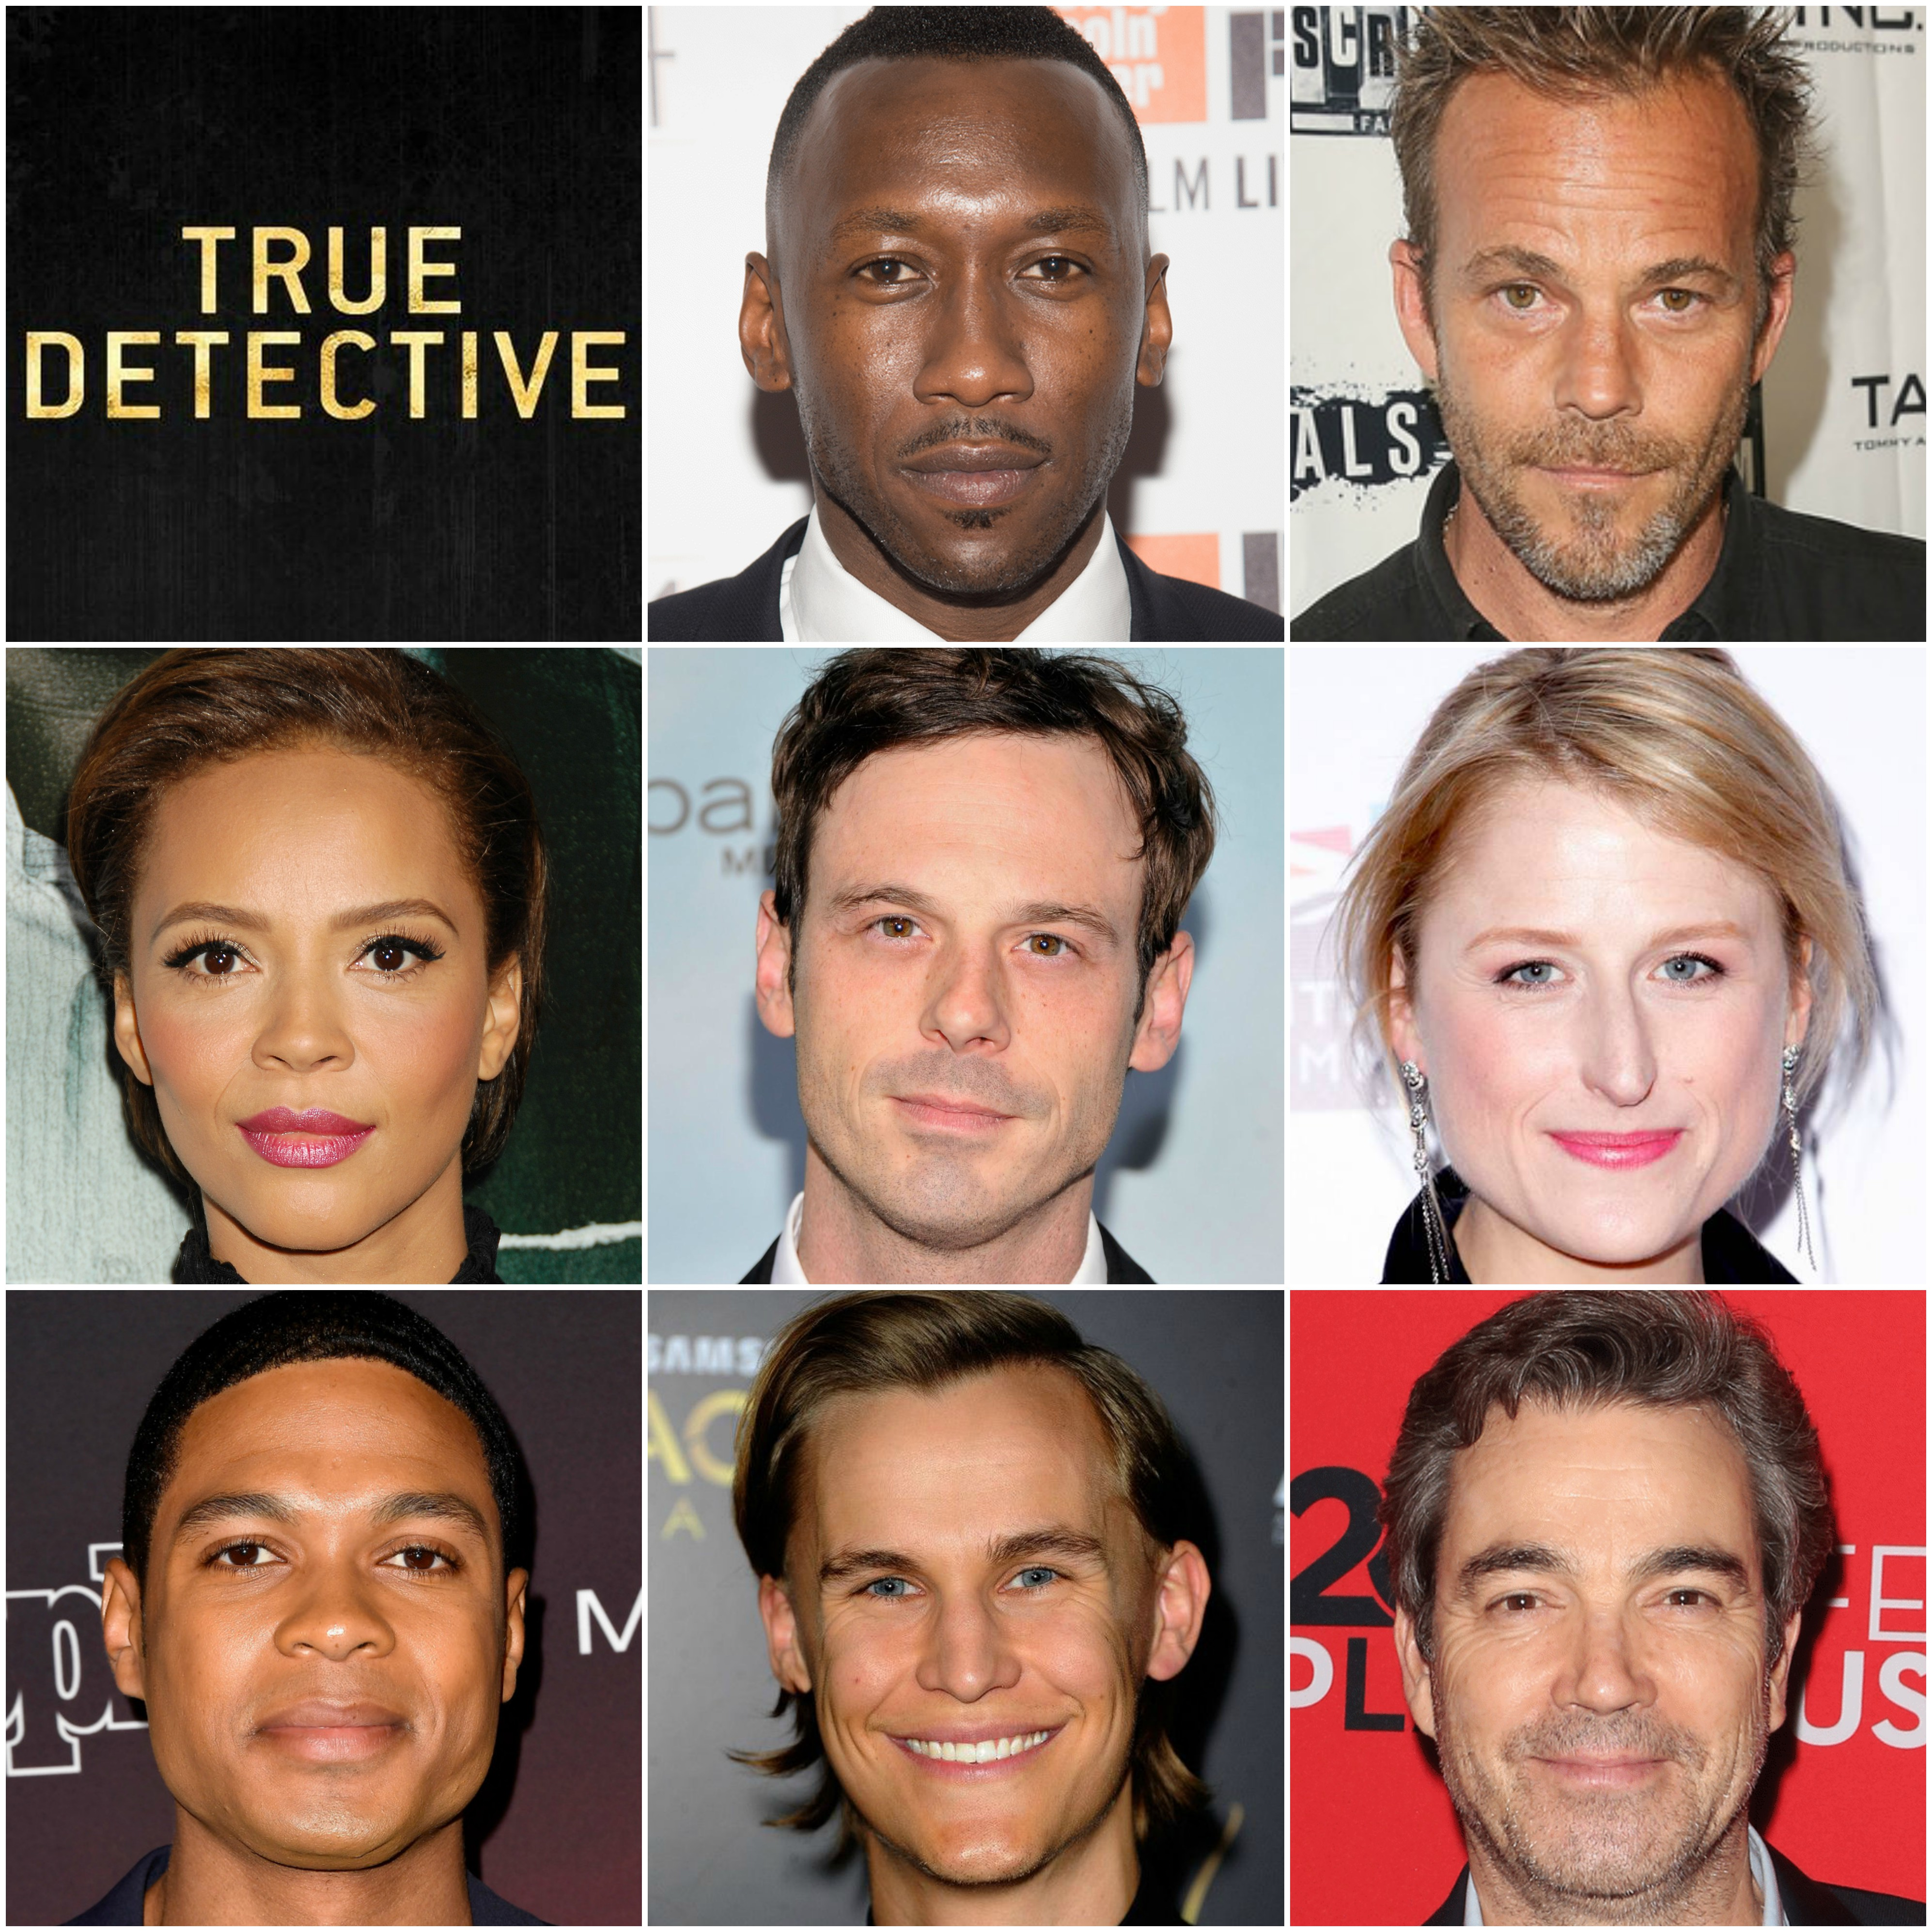 True detective season 2 date in Australia